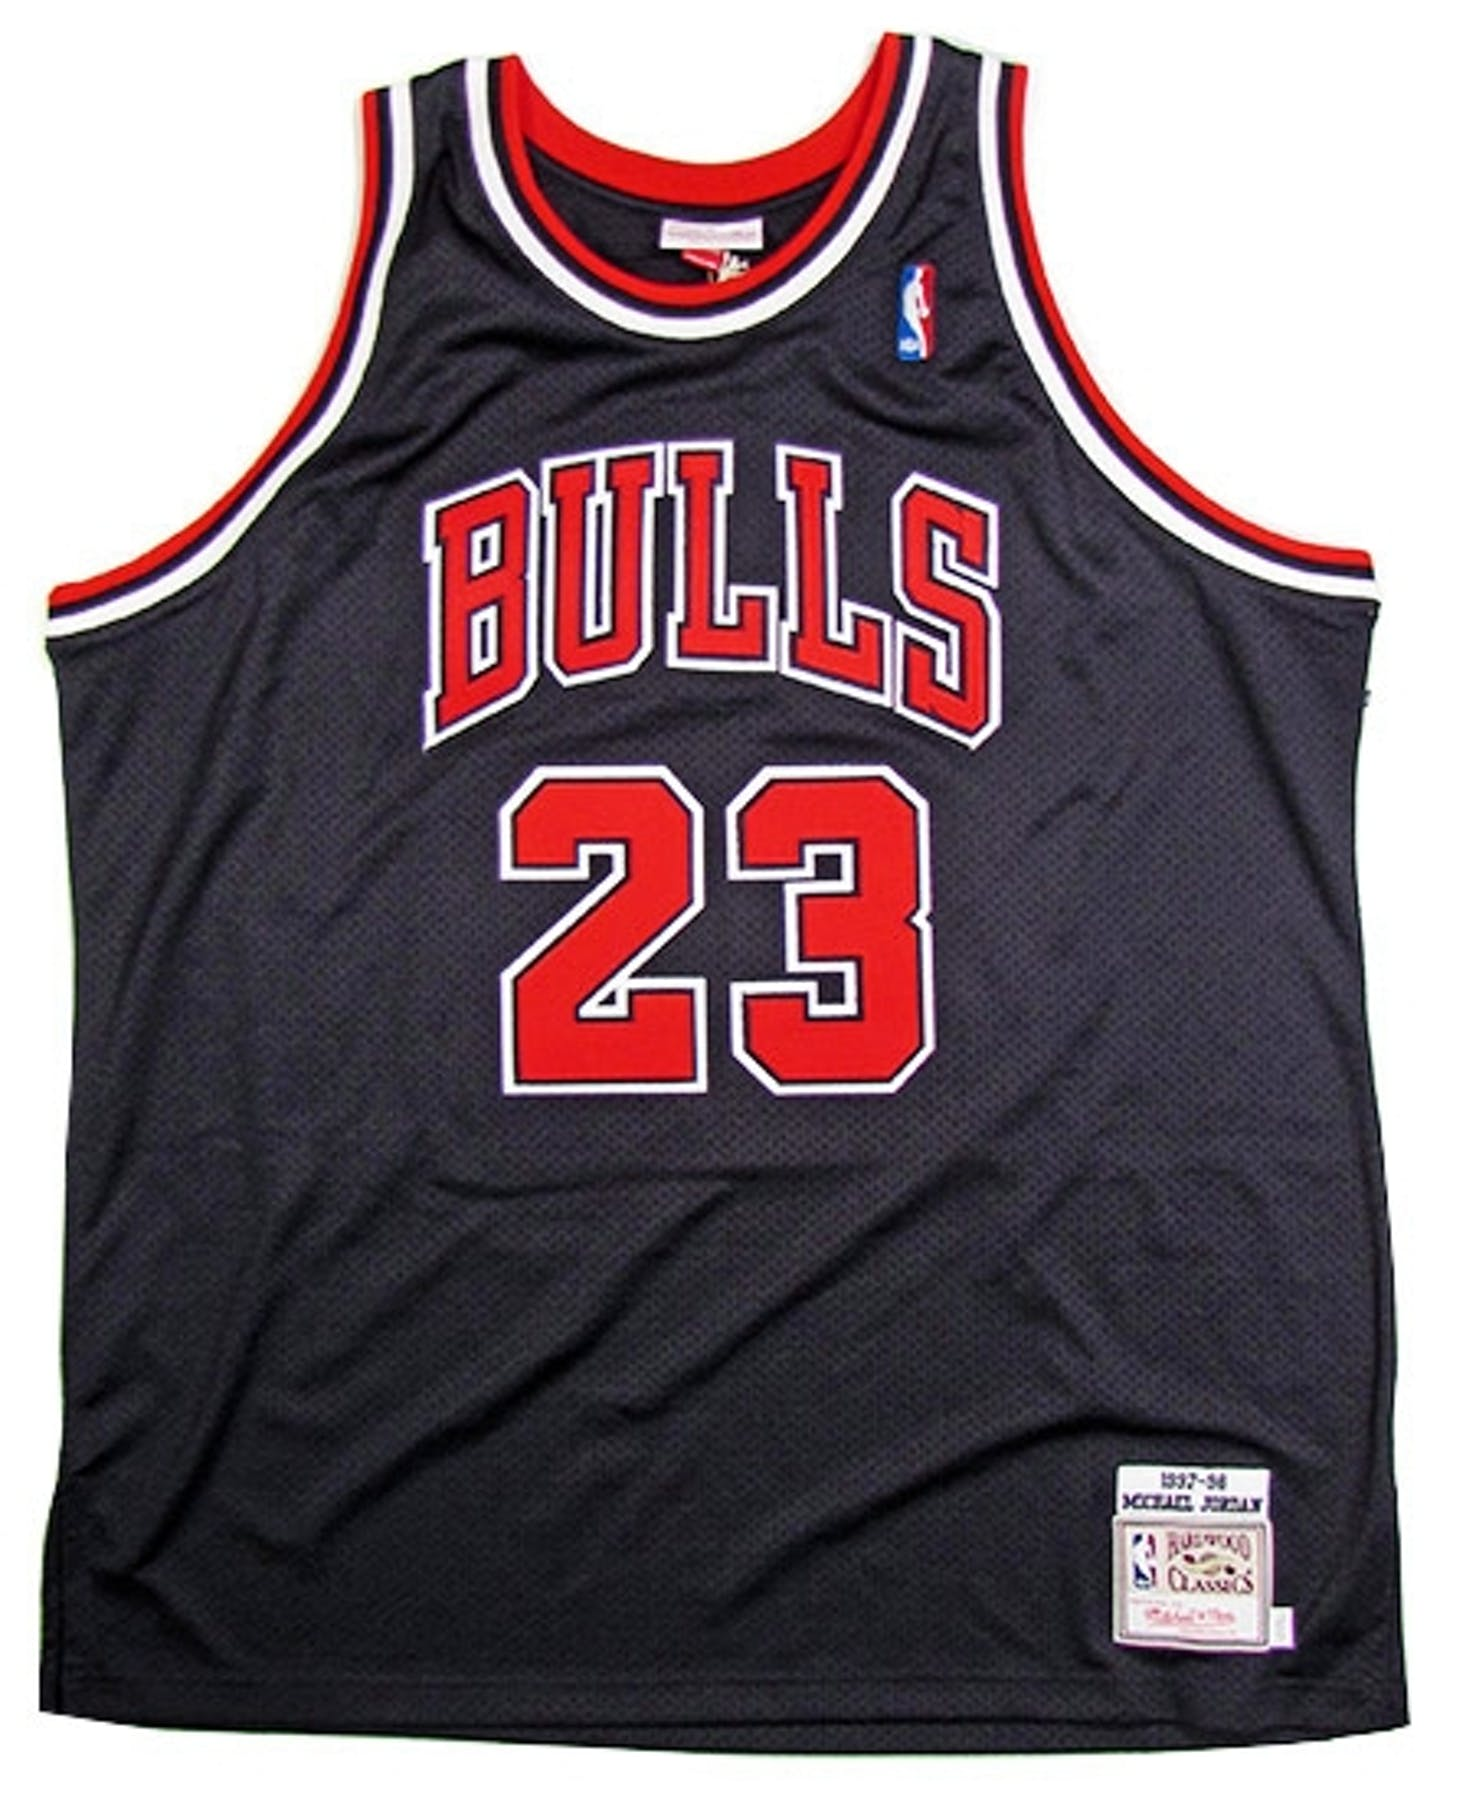 f702141e7dd ... Michael Jordan Autographed Chicago Bulls Black Authentic Basketball  Jersey (UDA COA) top design 73687 ...